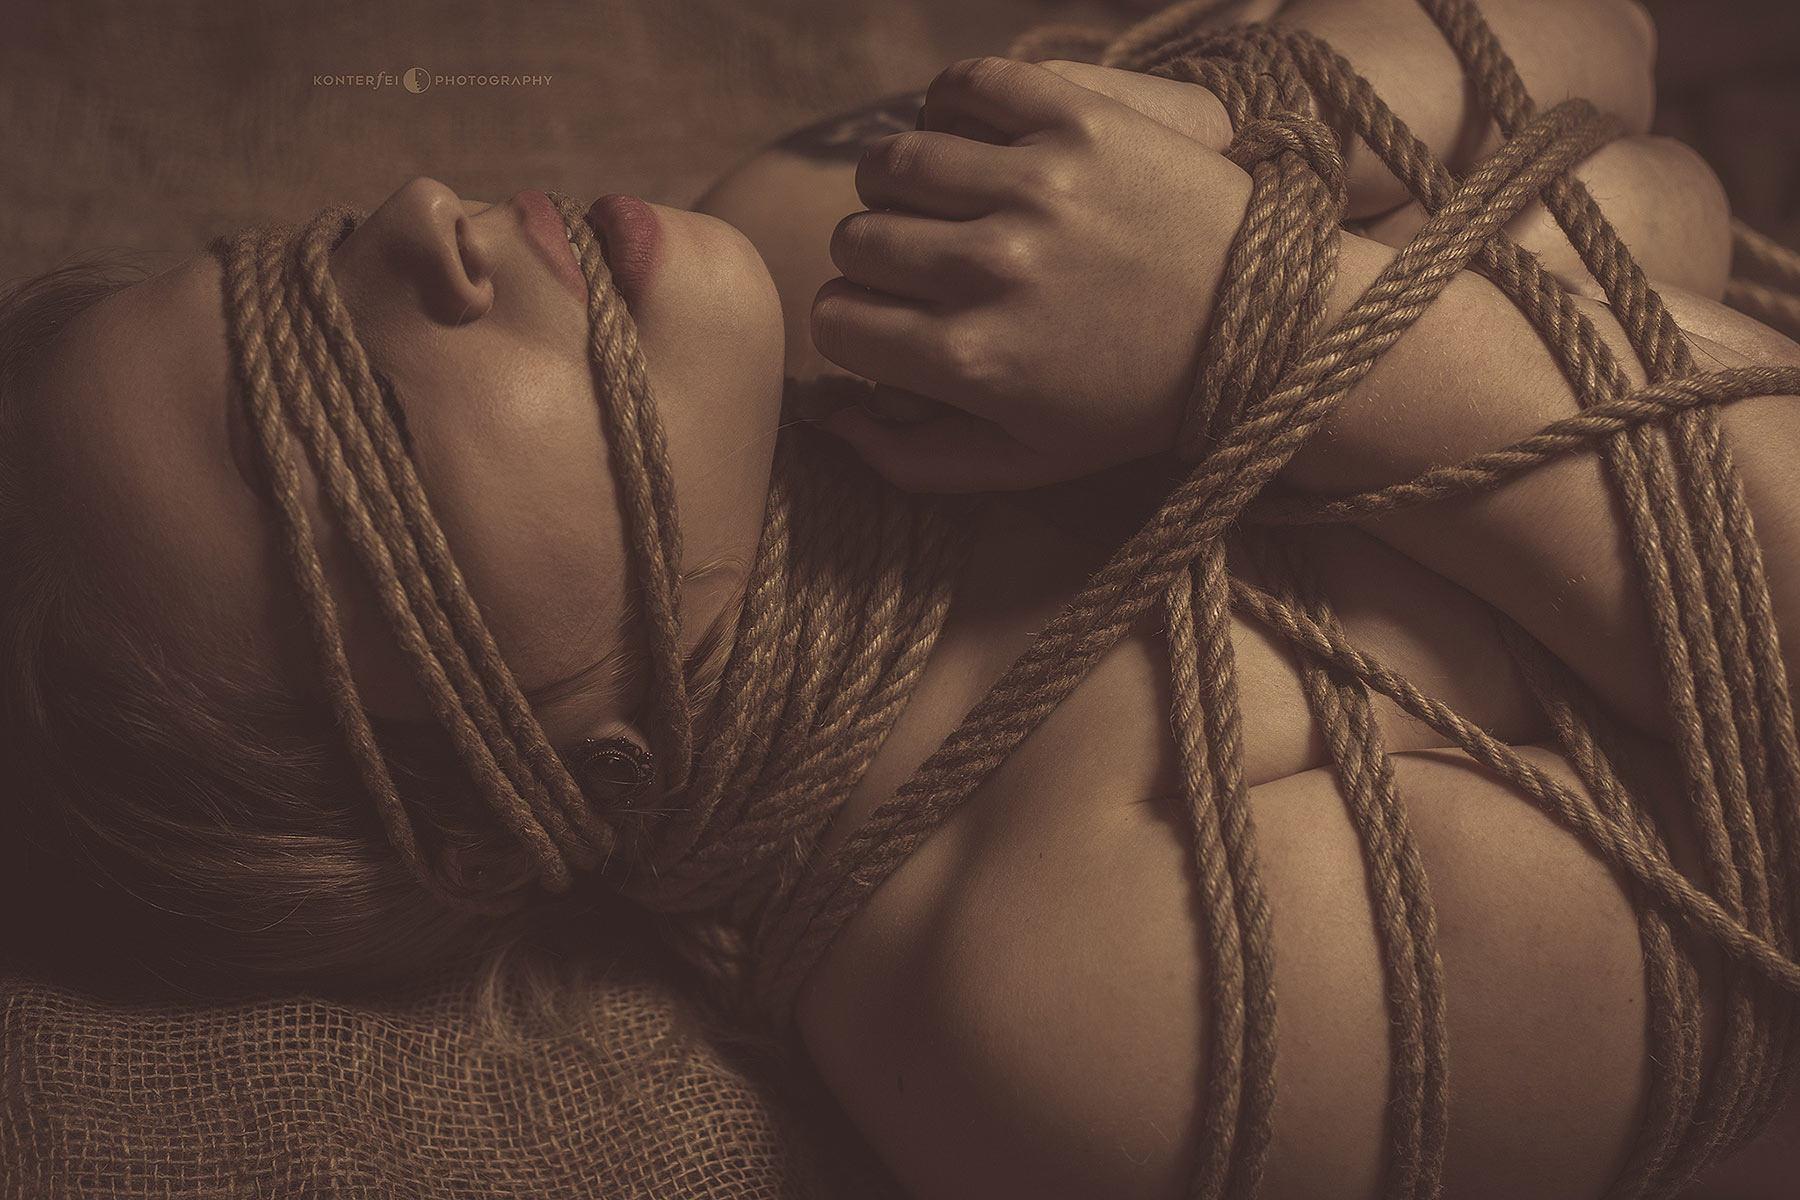 In Rope Heaven | Bondage | Photography